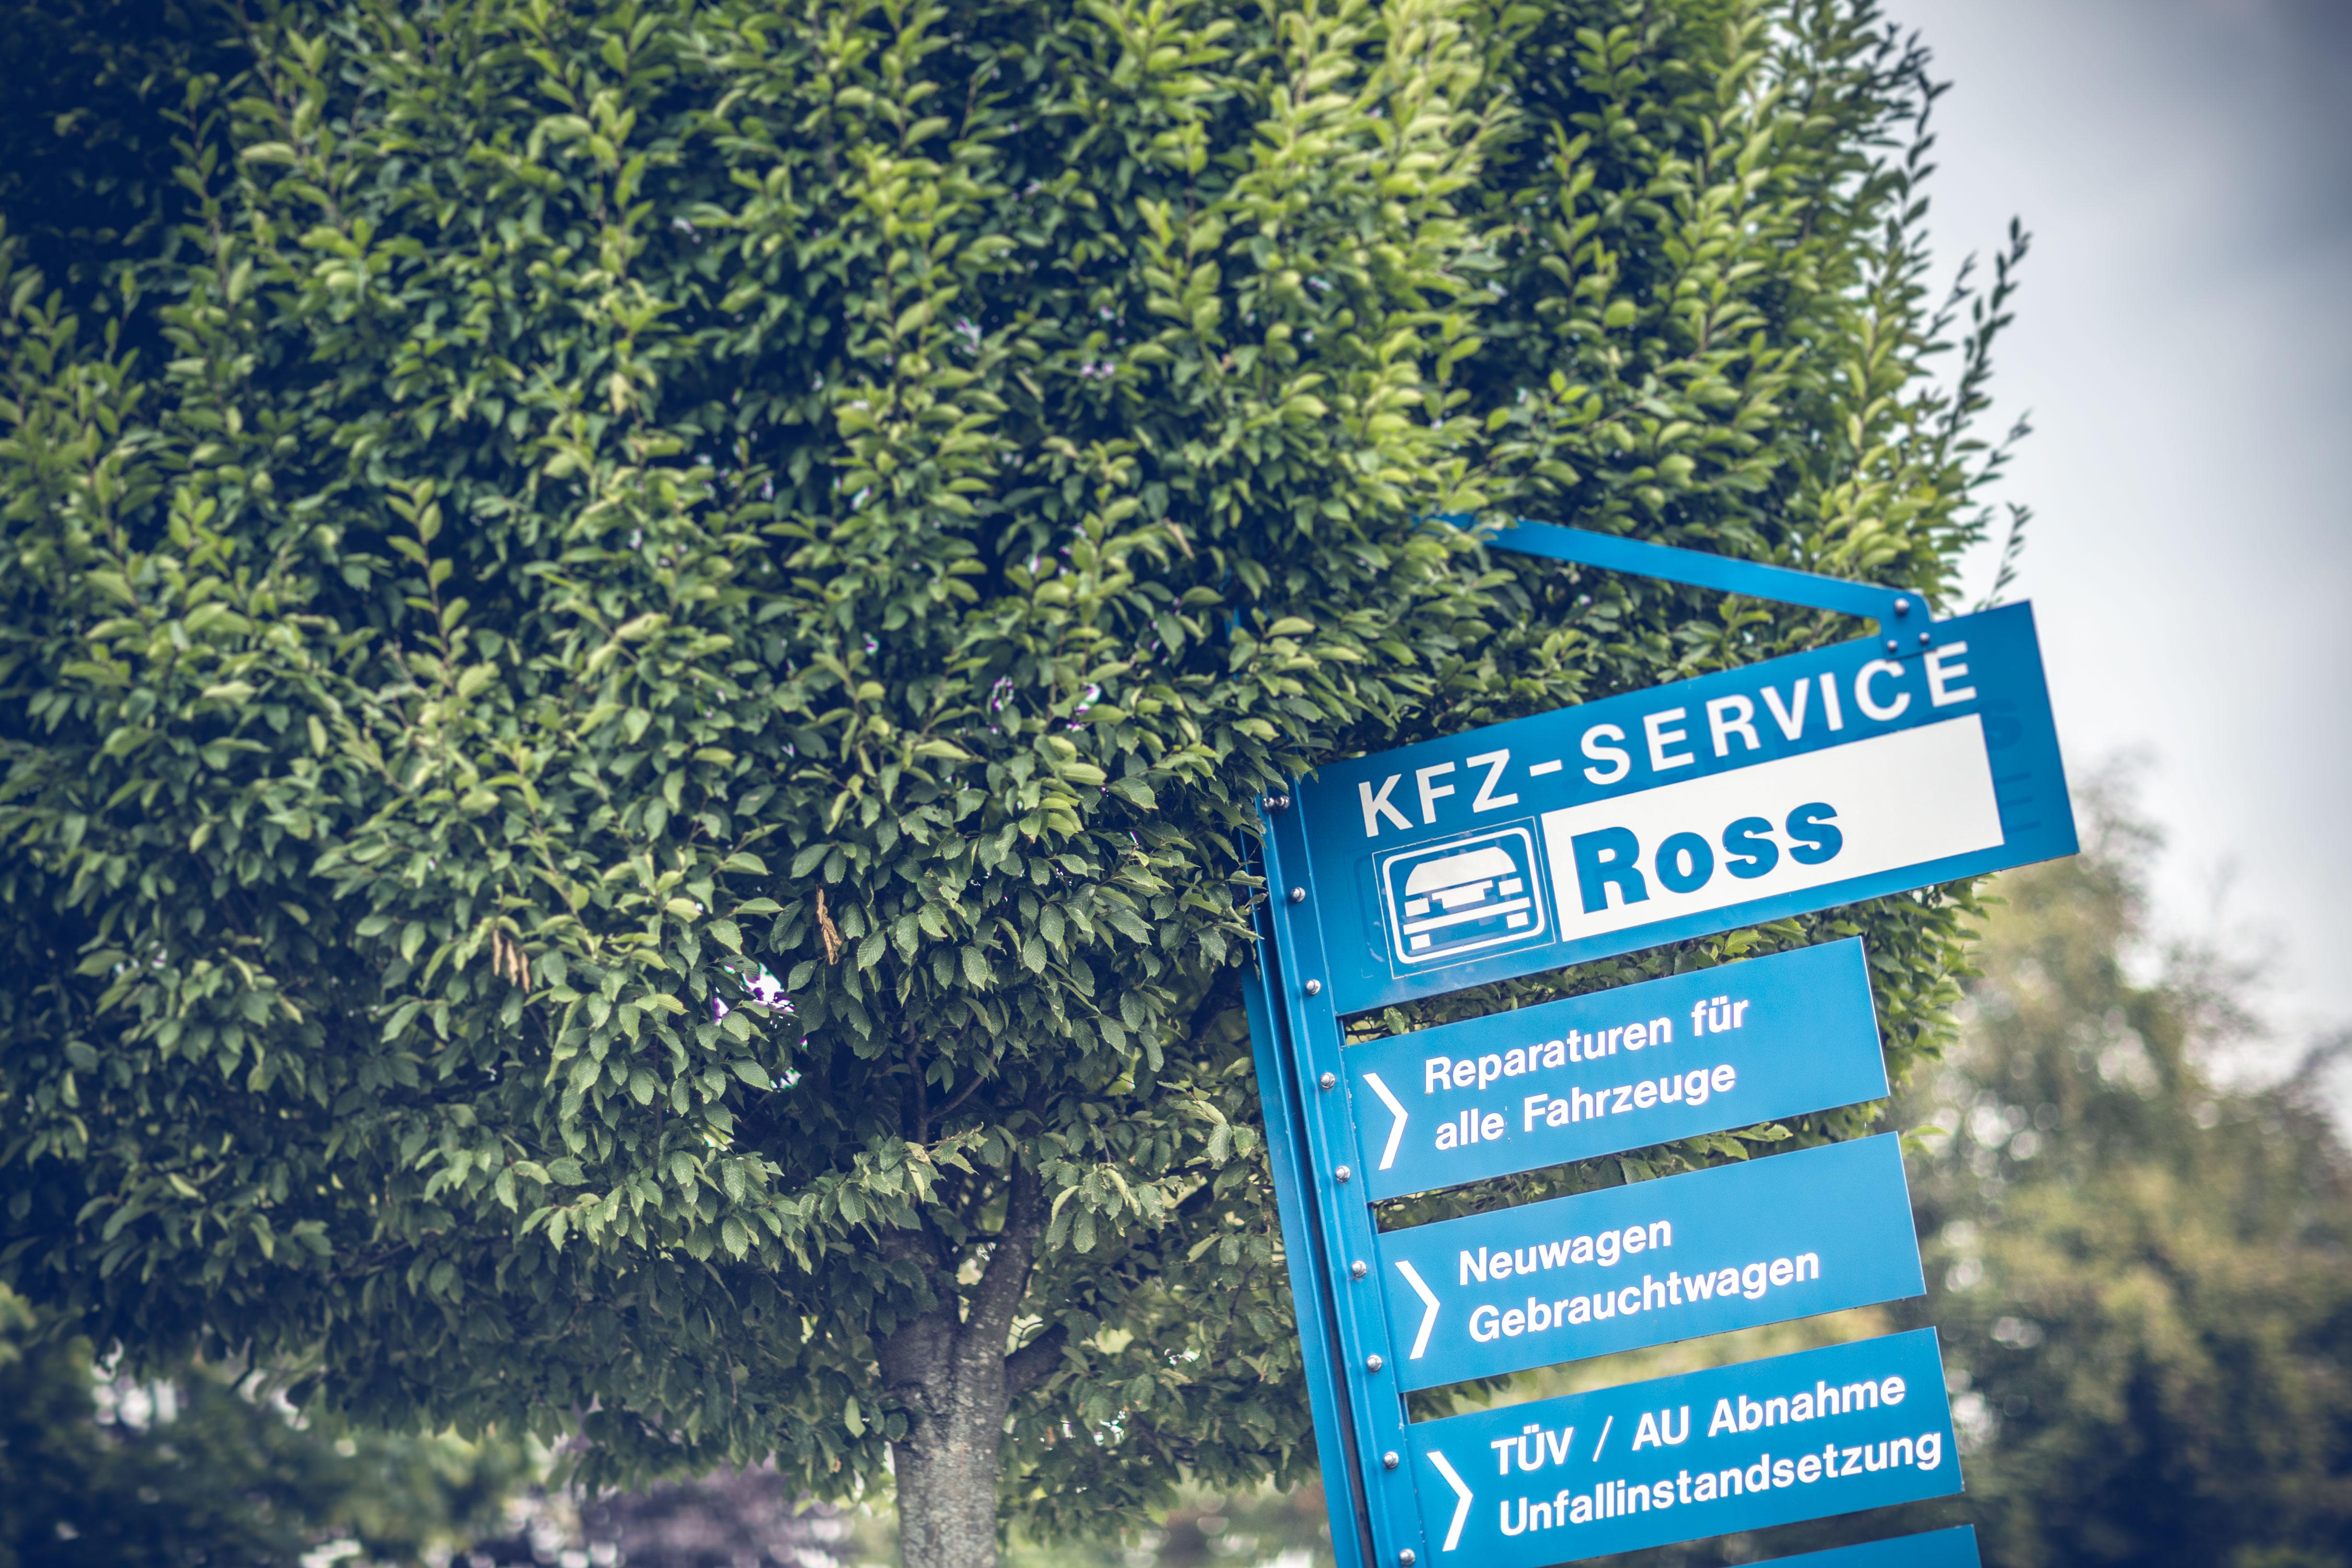 Autoservice Schild der KFZ Werkstatt Ross in Hiddingsel